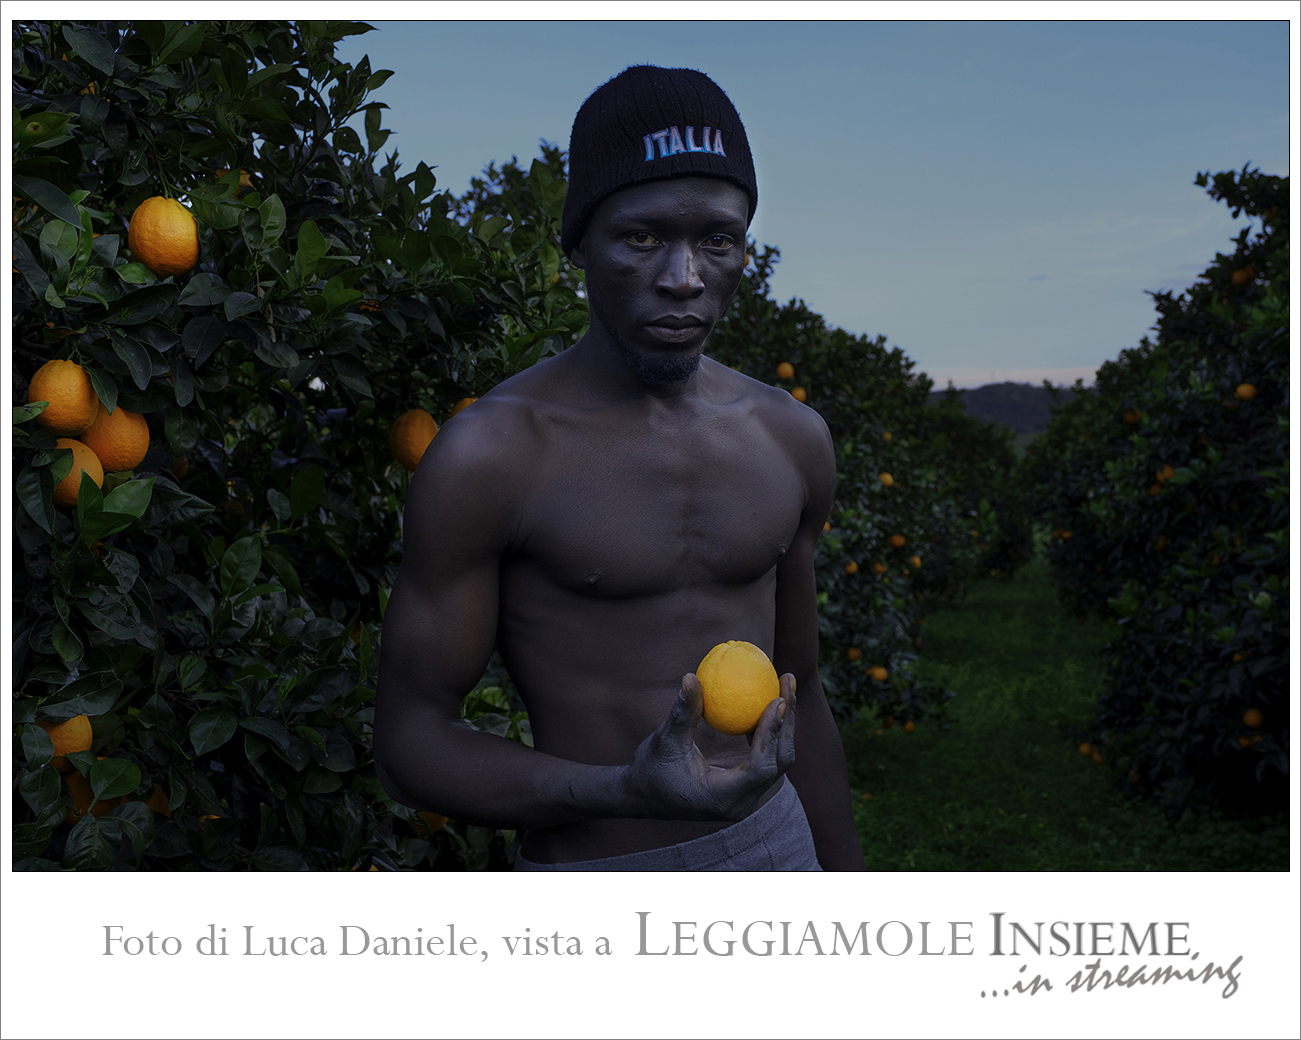 Luca_Daniele